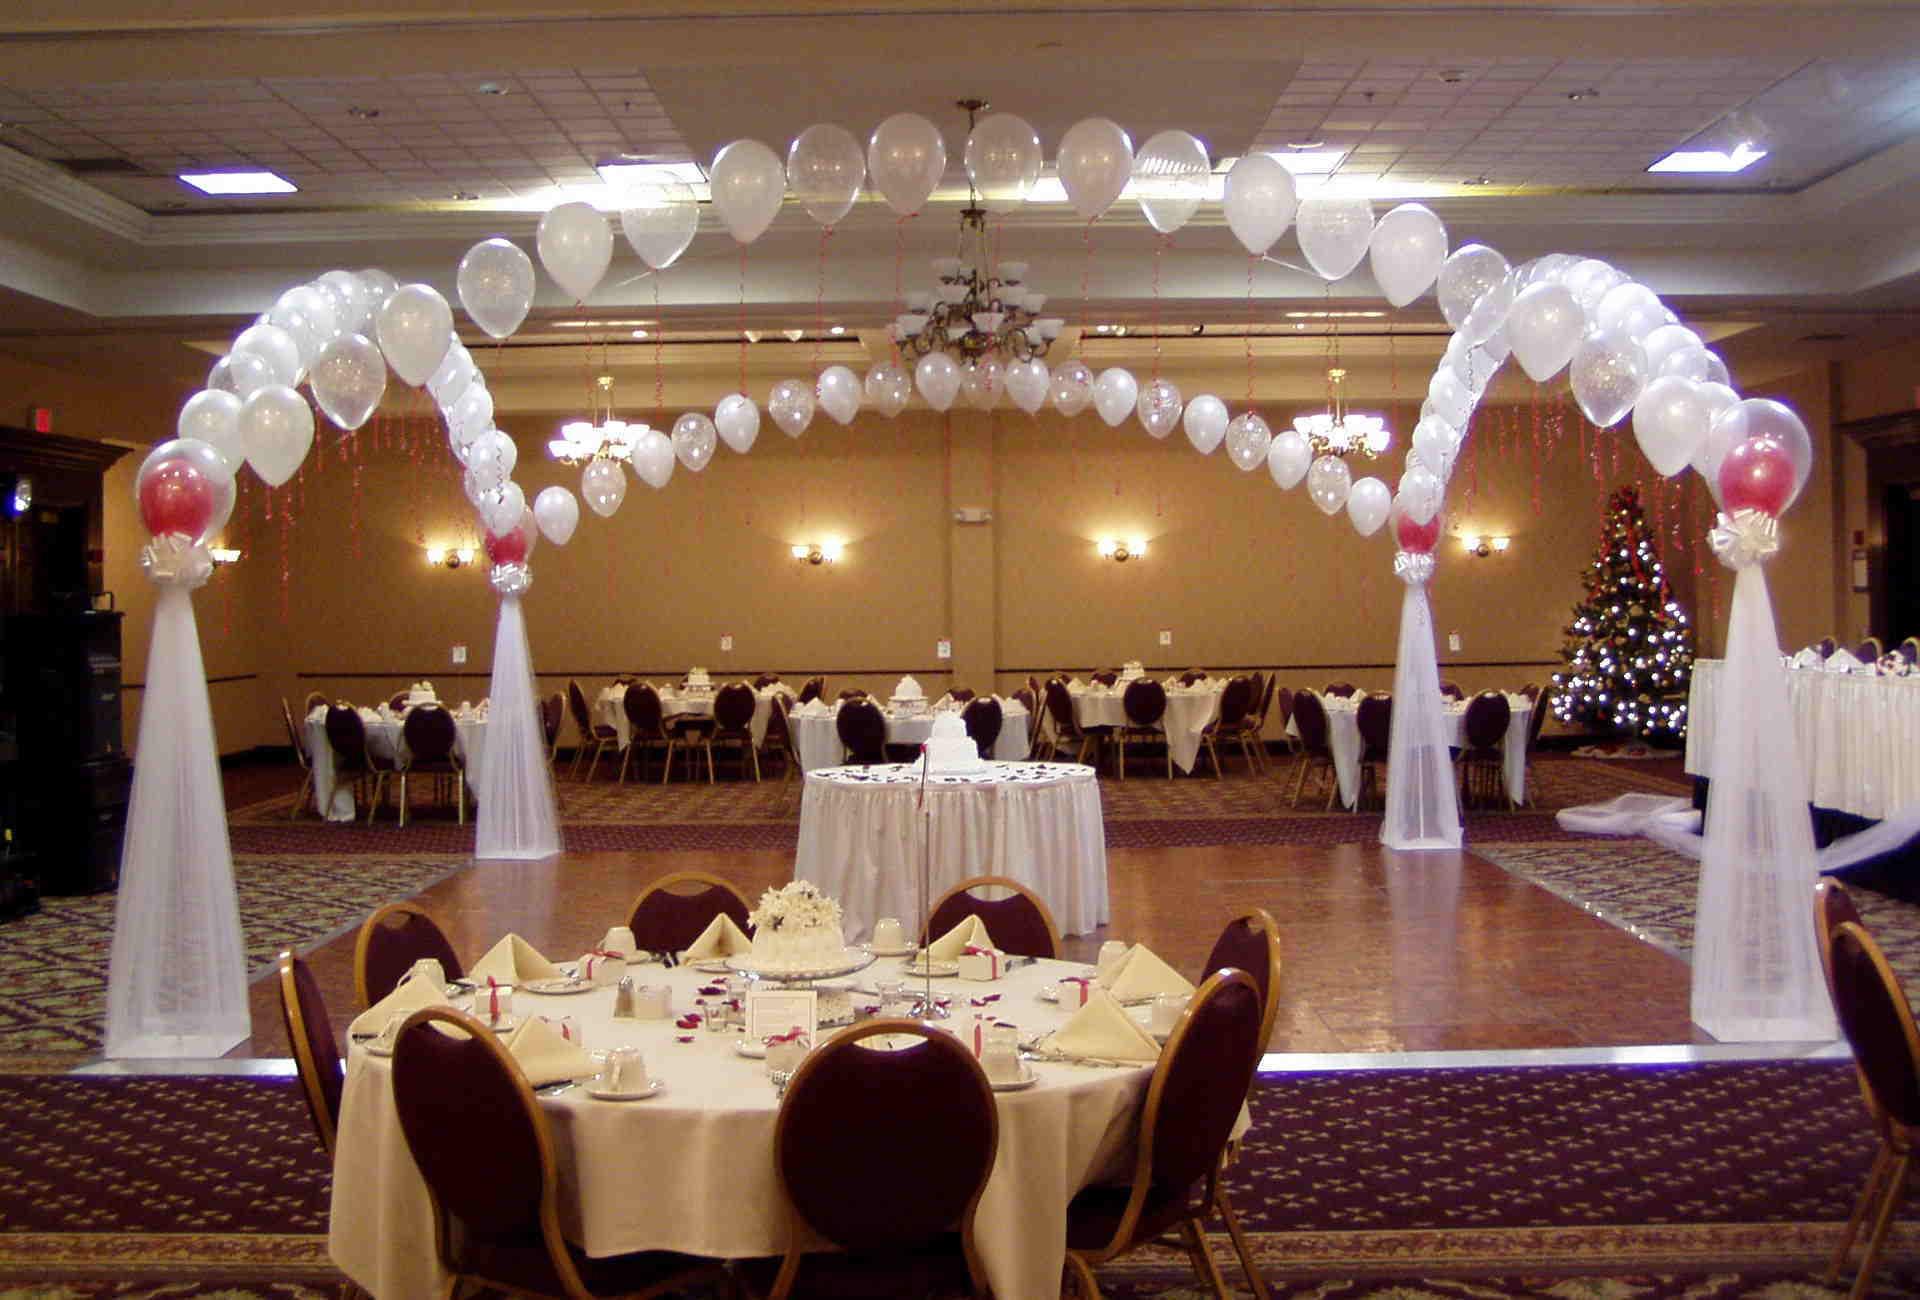 Cheap-Extraordinary-Balloon-Wedding-Decorations Wonderful ideas for decorating your wedding